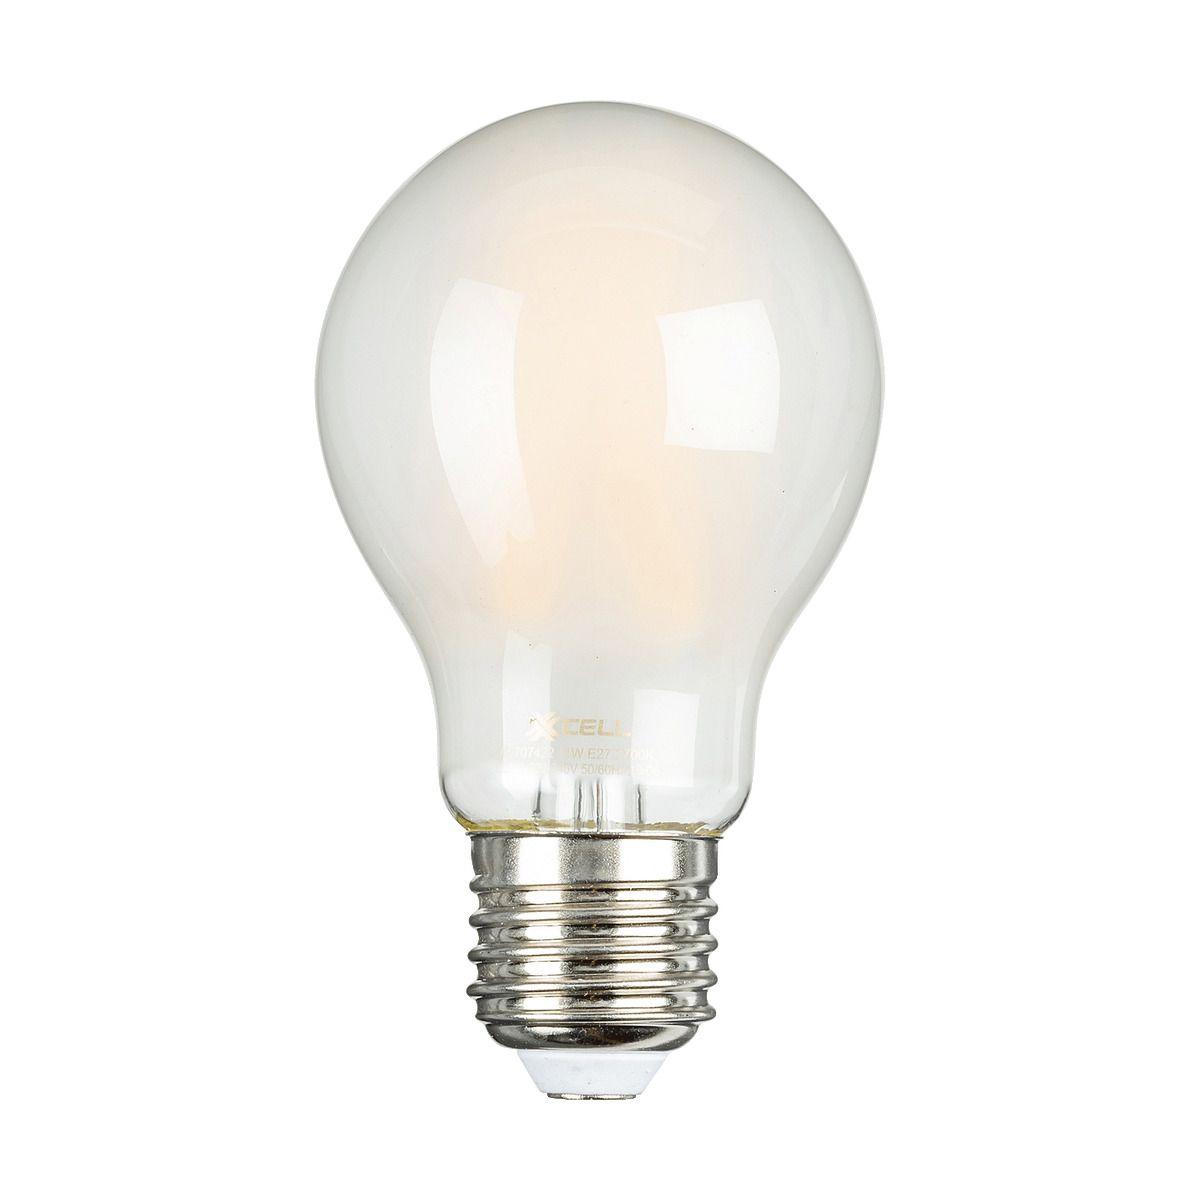 Ampoule Led A Filament Dimmable Culot E27 Blanc Chaud Alinea